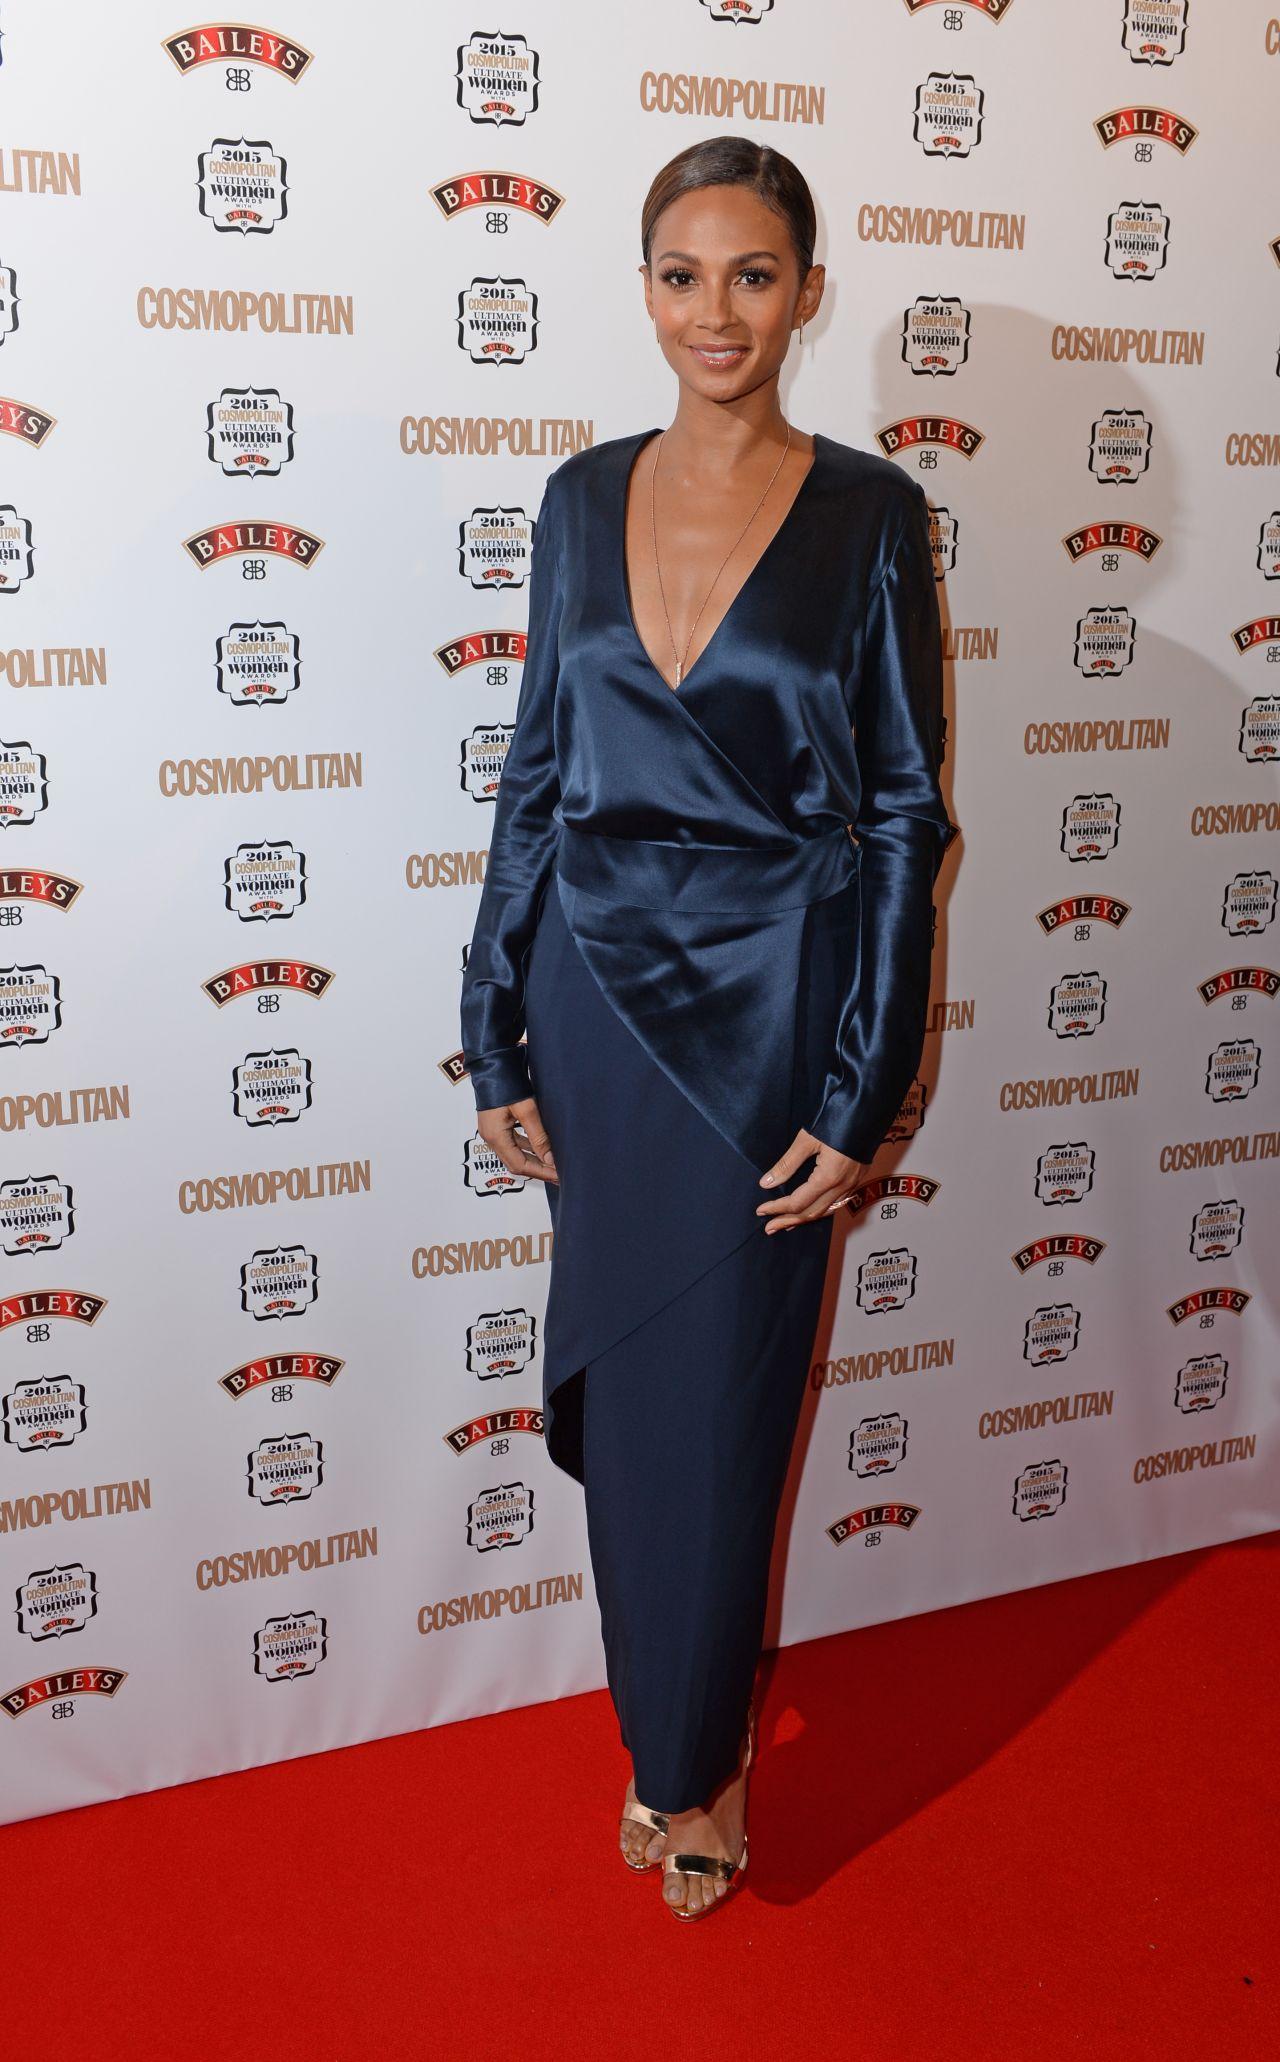 Alesha dixon pictures cosmopolitan ultimate women of the year awards - Alesha Dixon 2015 Cosmopolitan Ultimate Women Of The Year Awards In London